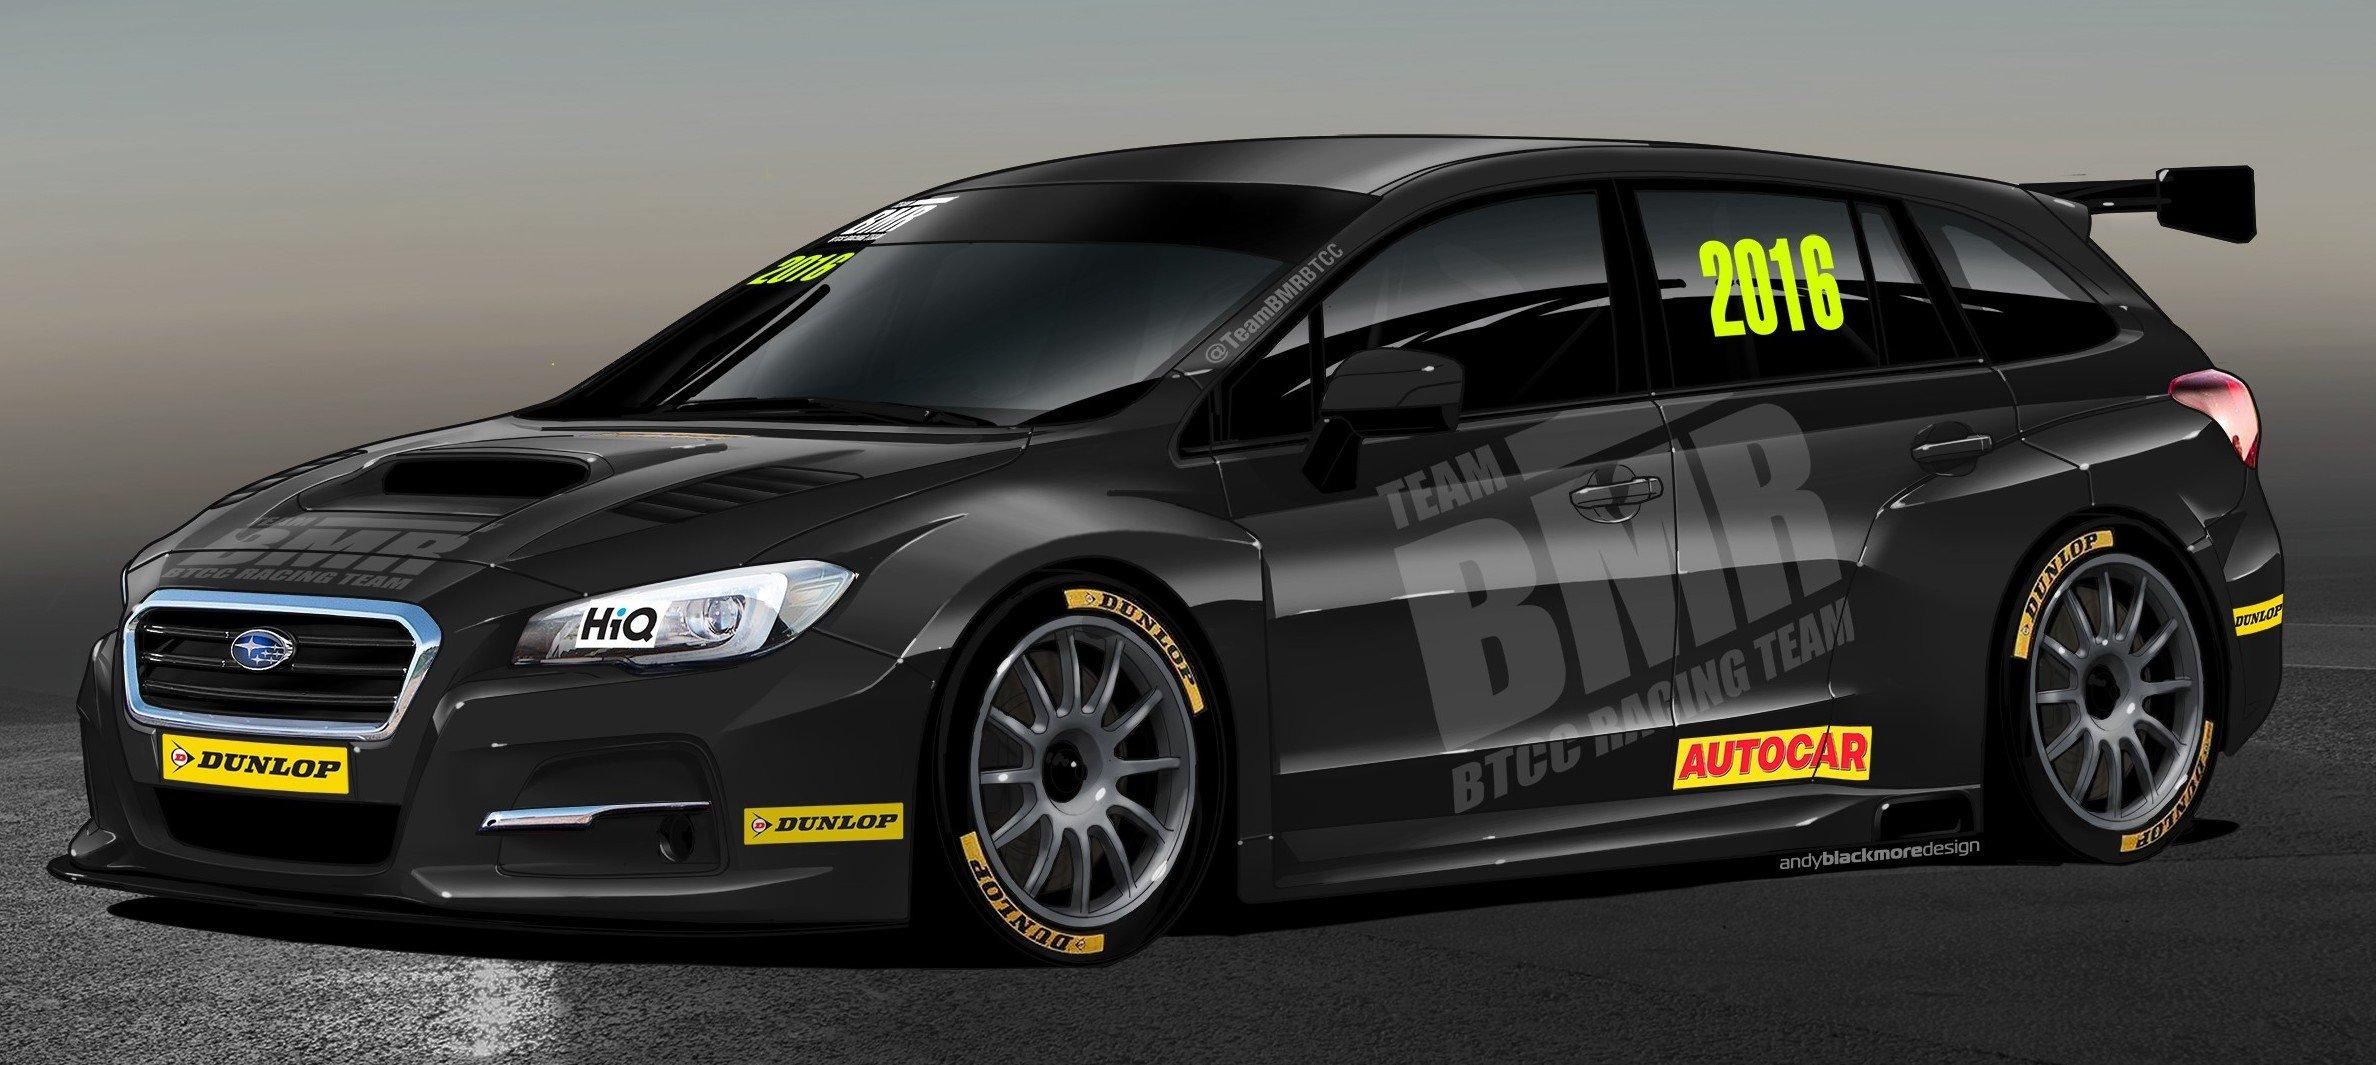 Subaru Levorg set to race in British Touring Car C'ship Image 428149